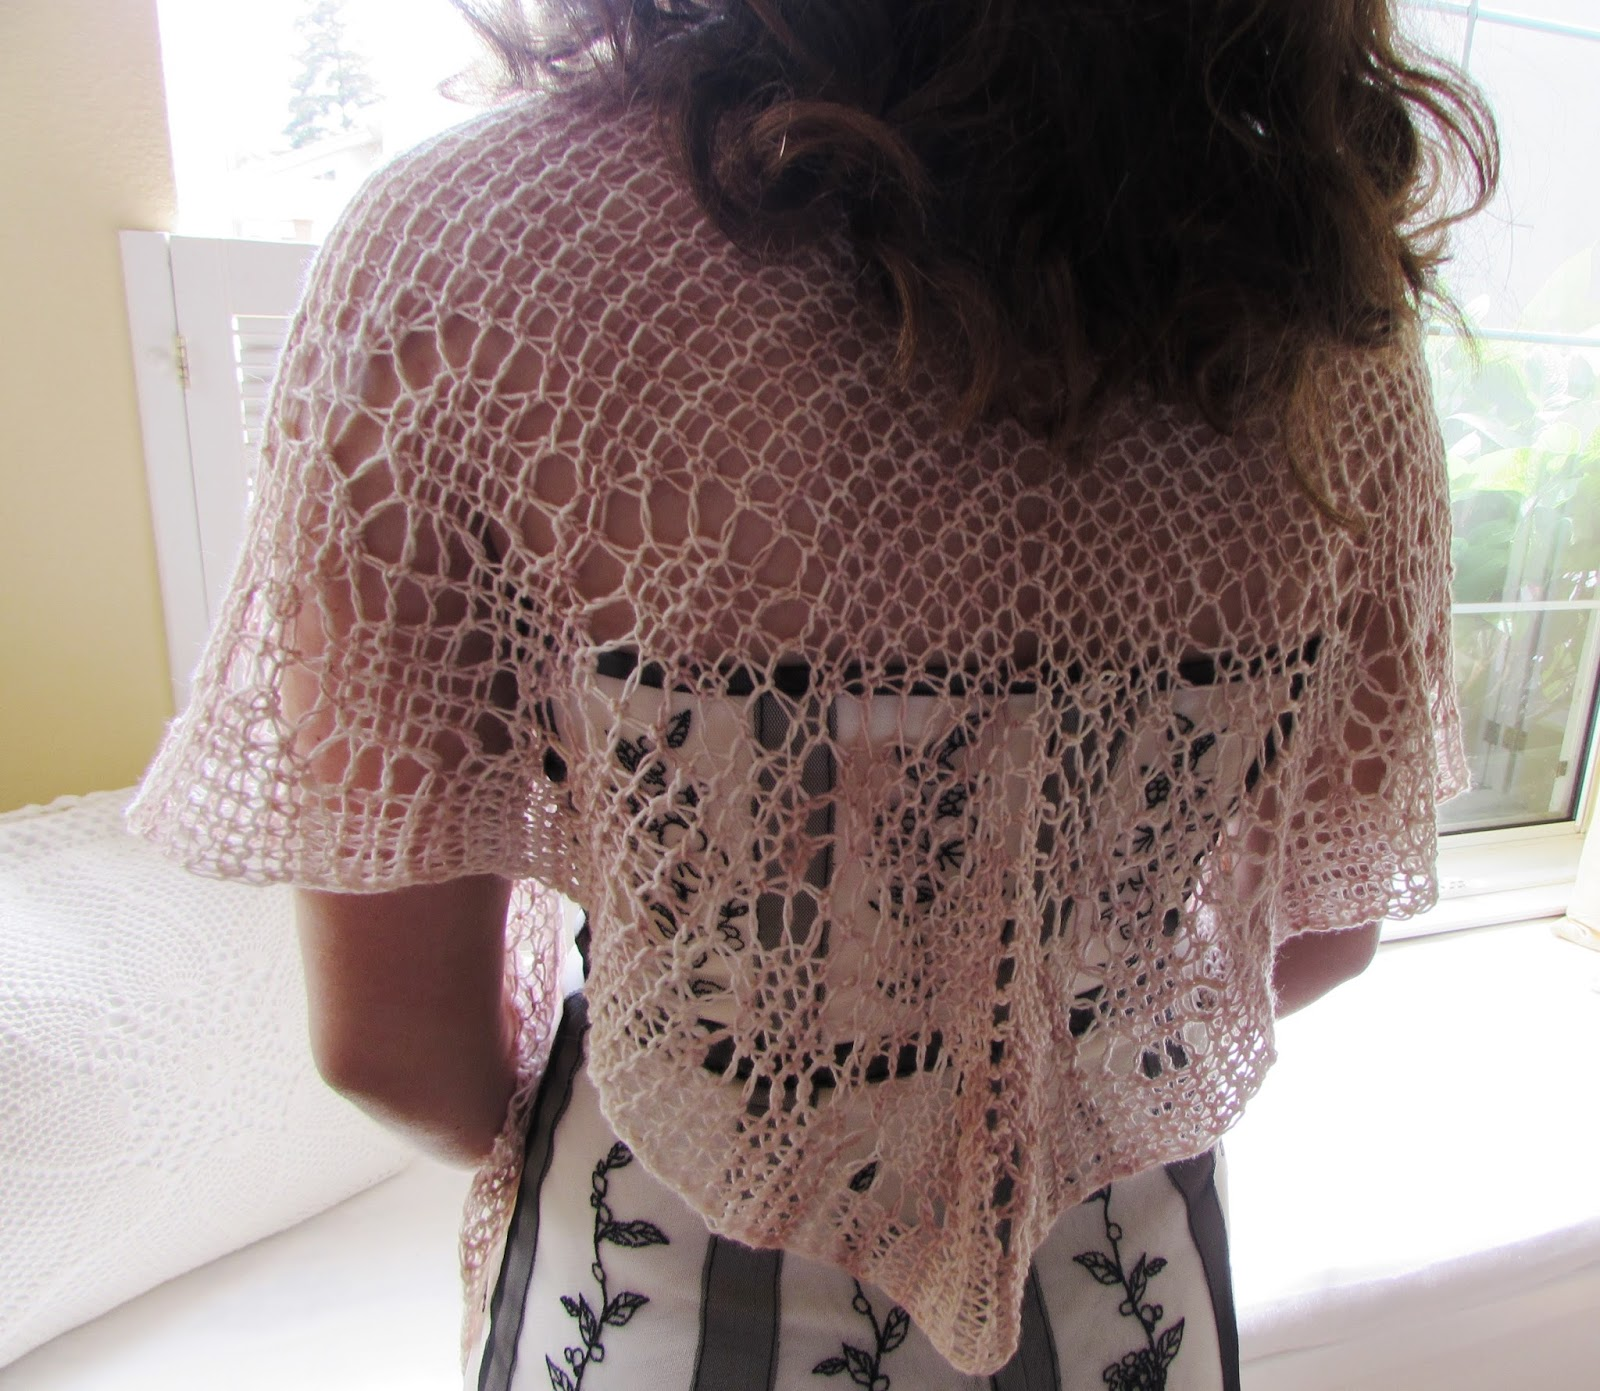 Loom Knit Shawl Pattern : Invisible Loom Innovative Patterns for Loom Knitters: Loom Knit Shawls III: R...